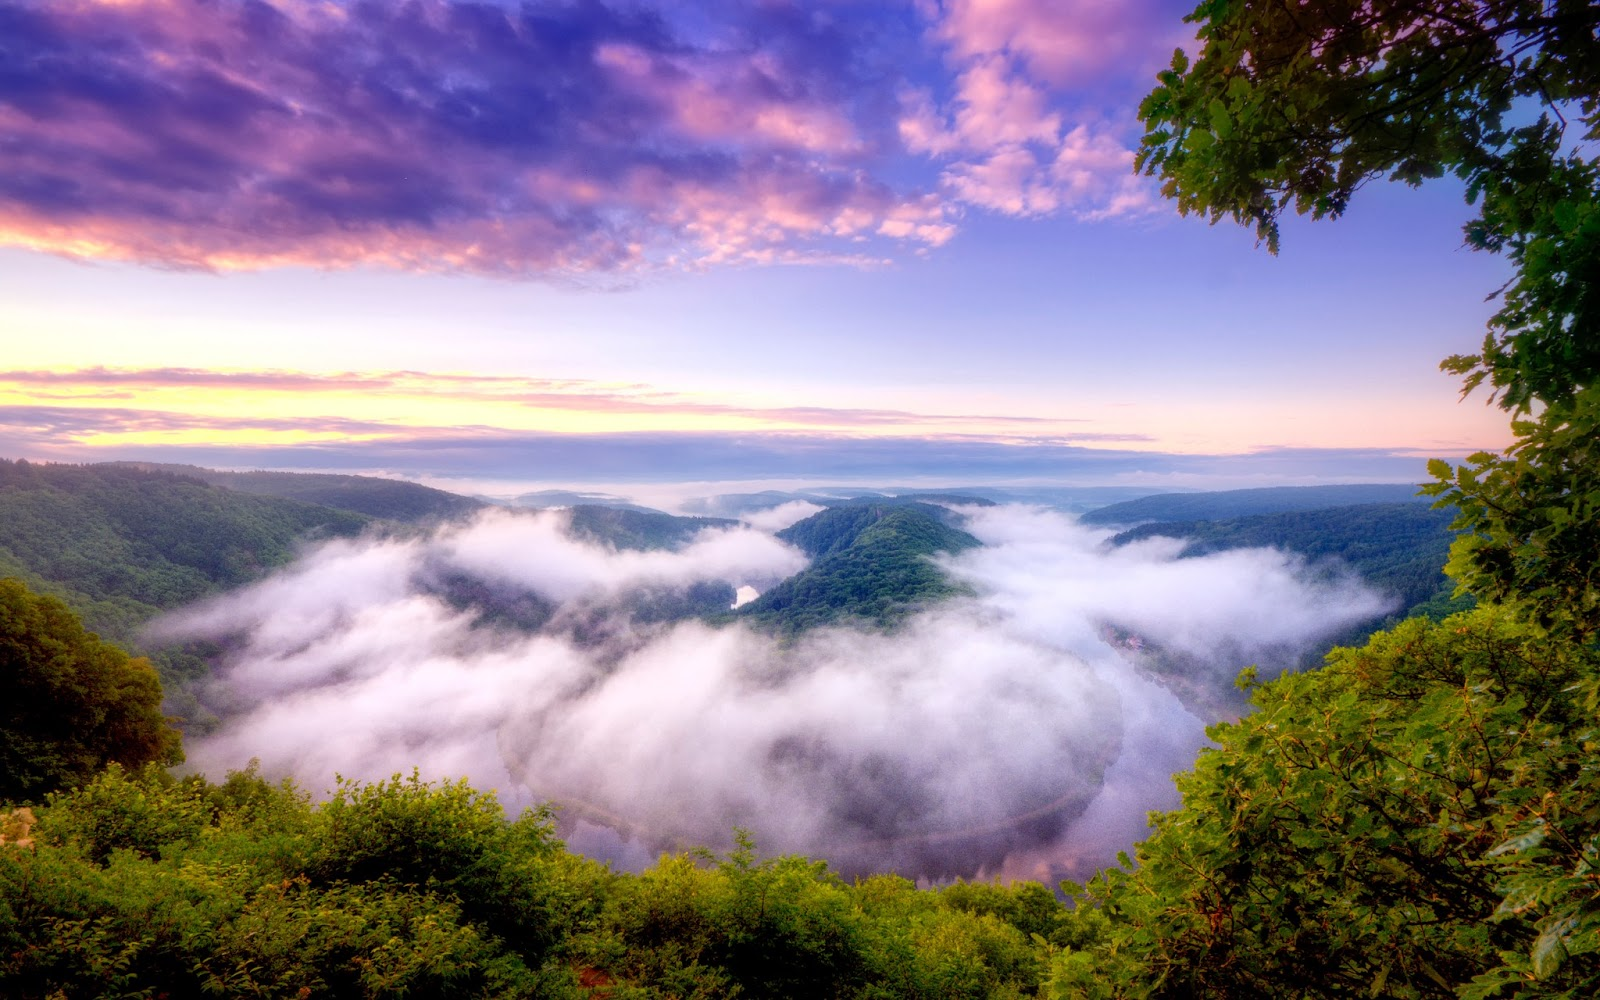 Beautiful Nature Hd Wallpapers 1080p Hd Wallpapers